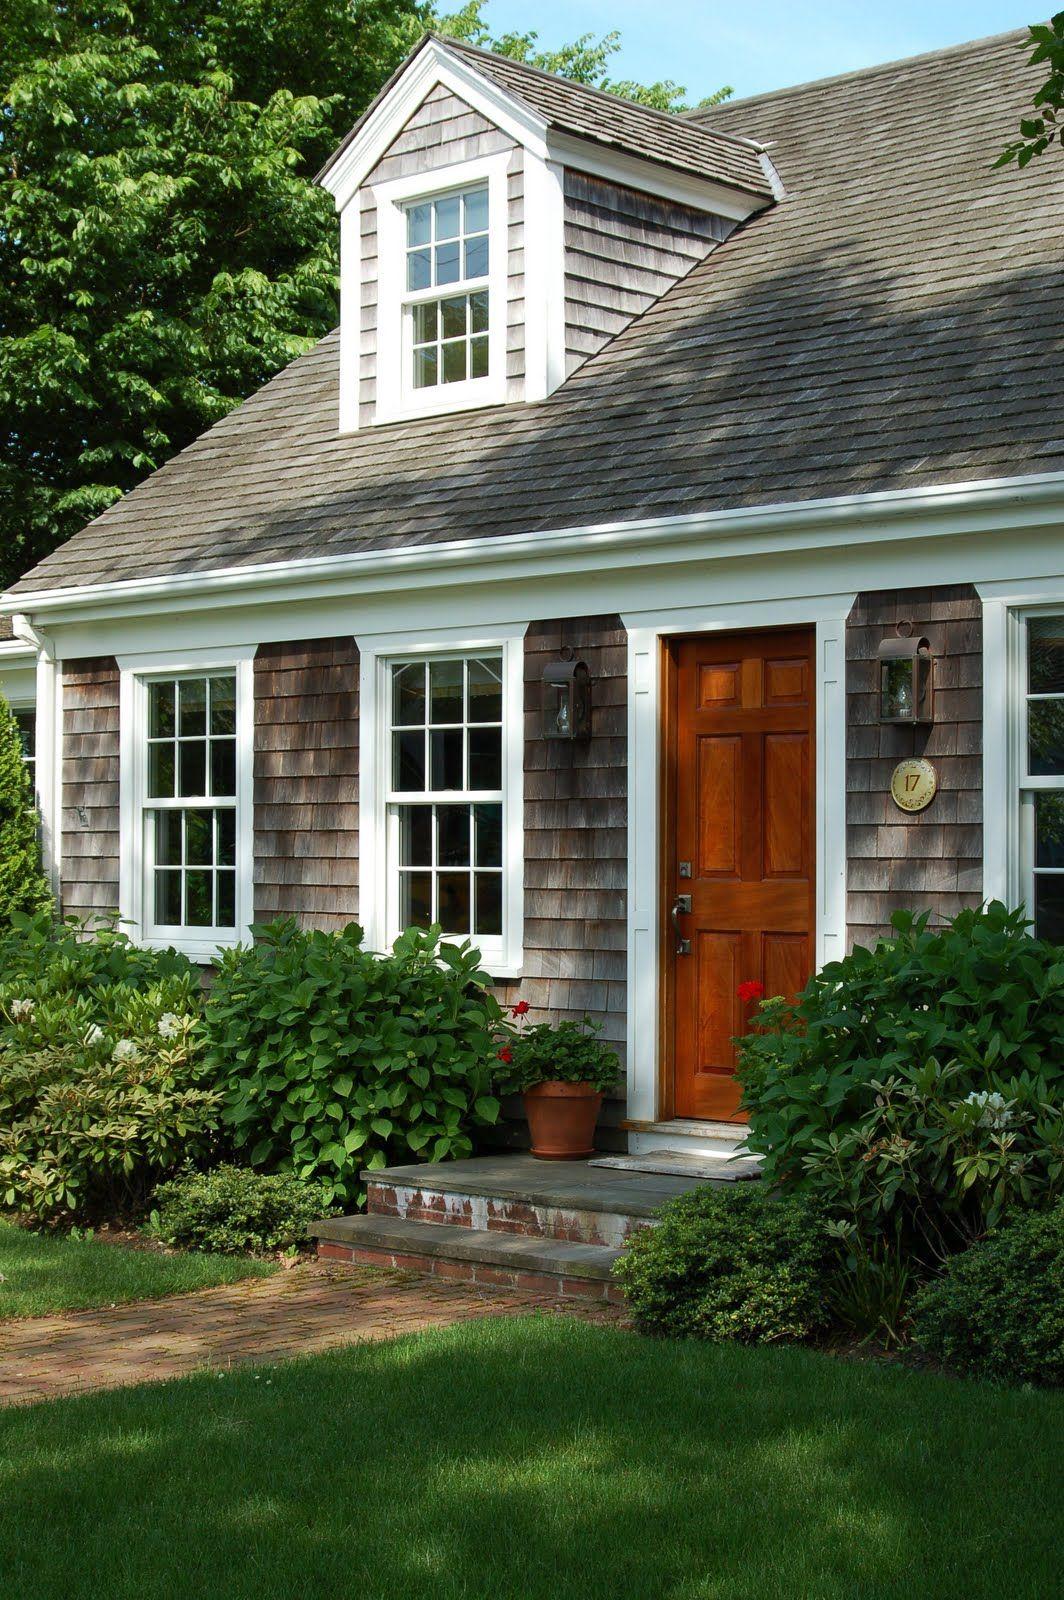 Martha S Vineyard Cape Cod Style House Cape Cod Style